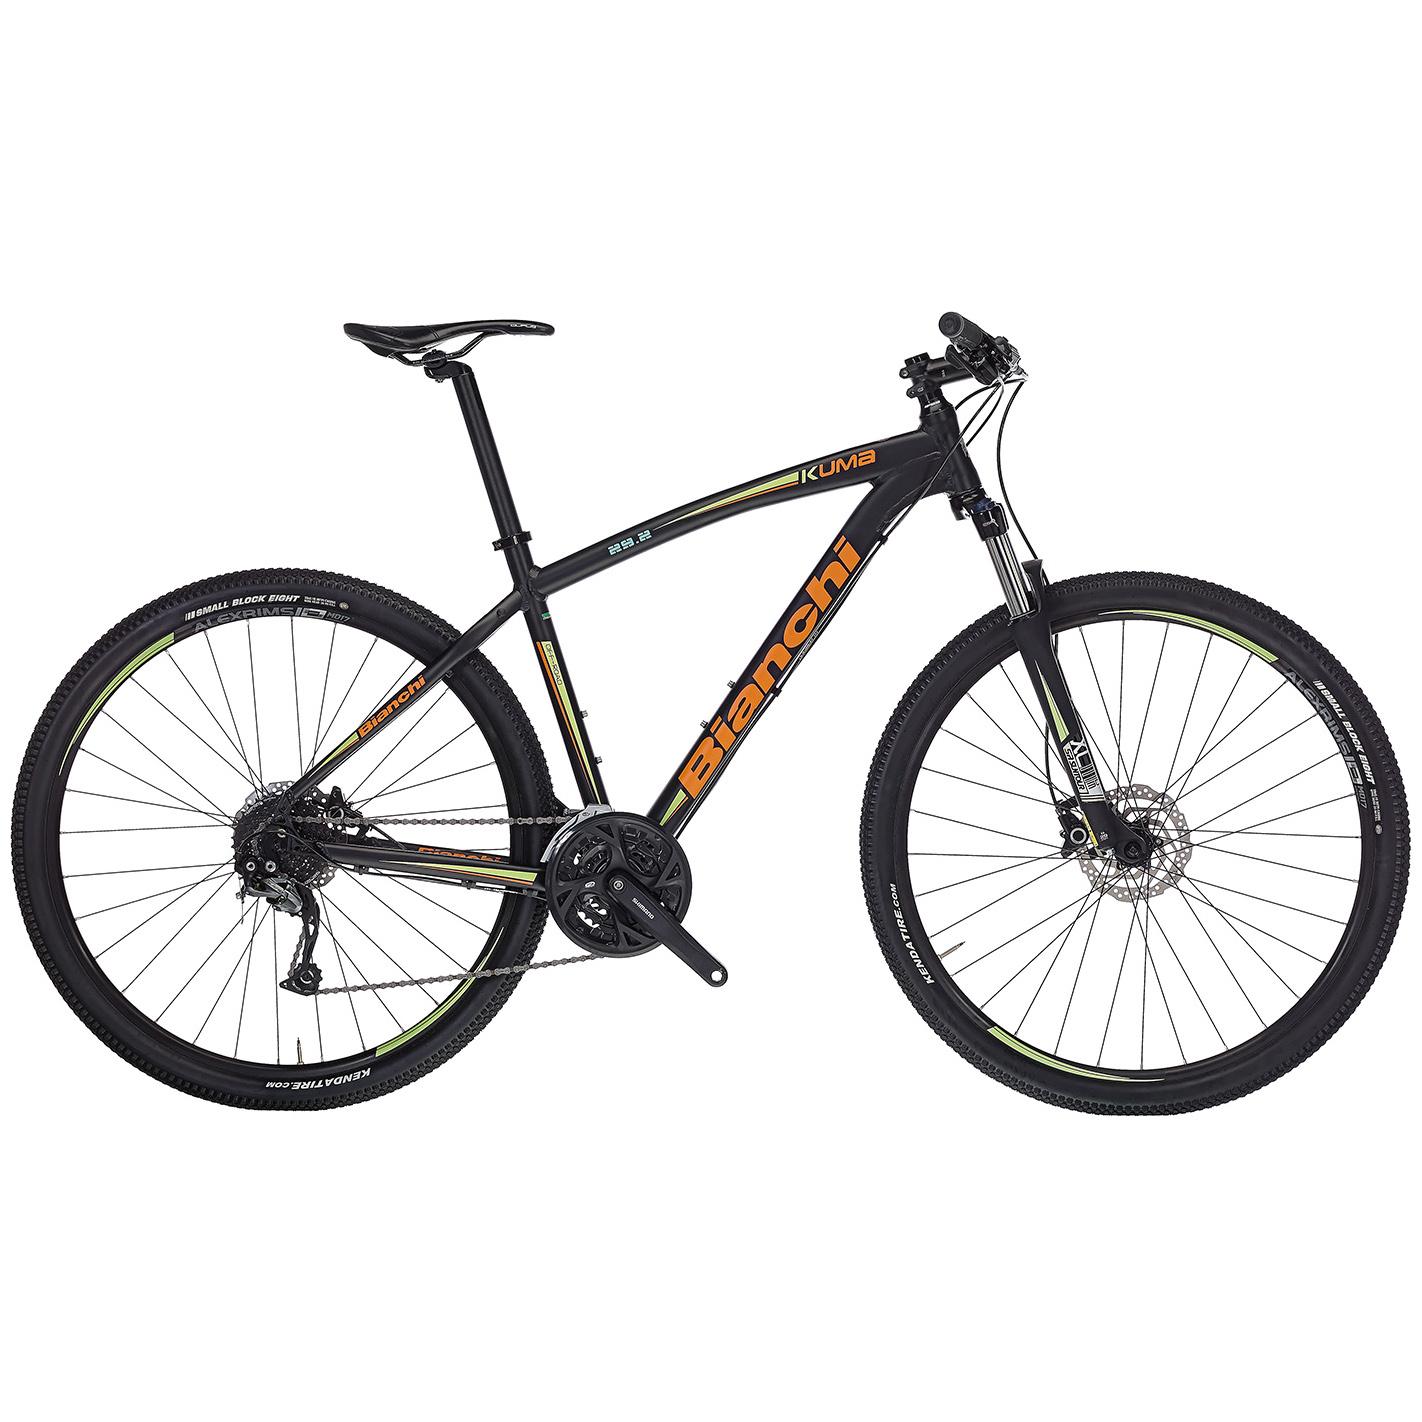 Bianchi Kuma 27.2 Alivio Mountain Bike - 2017